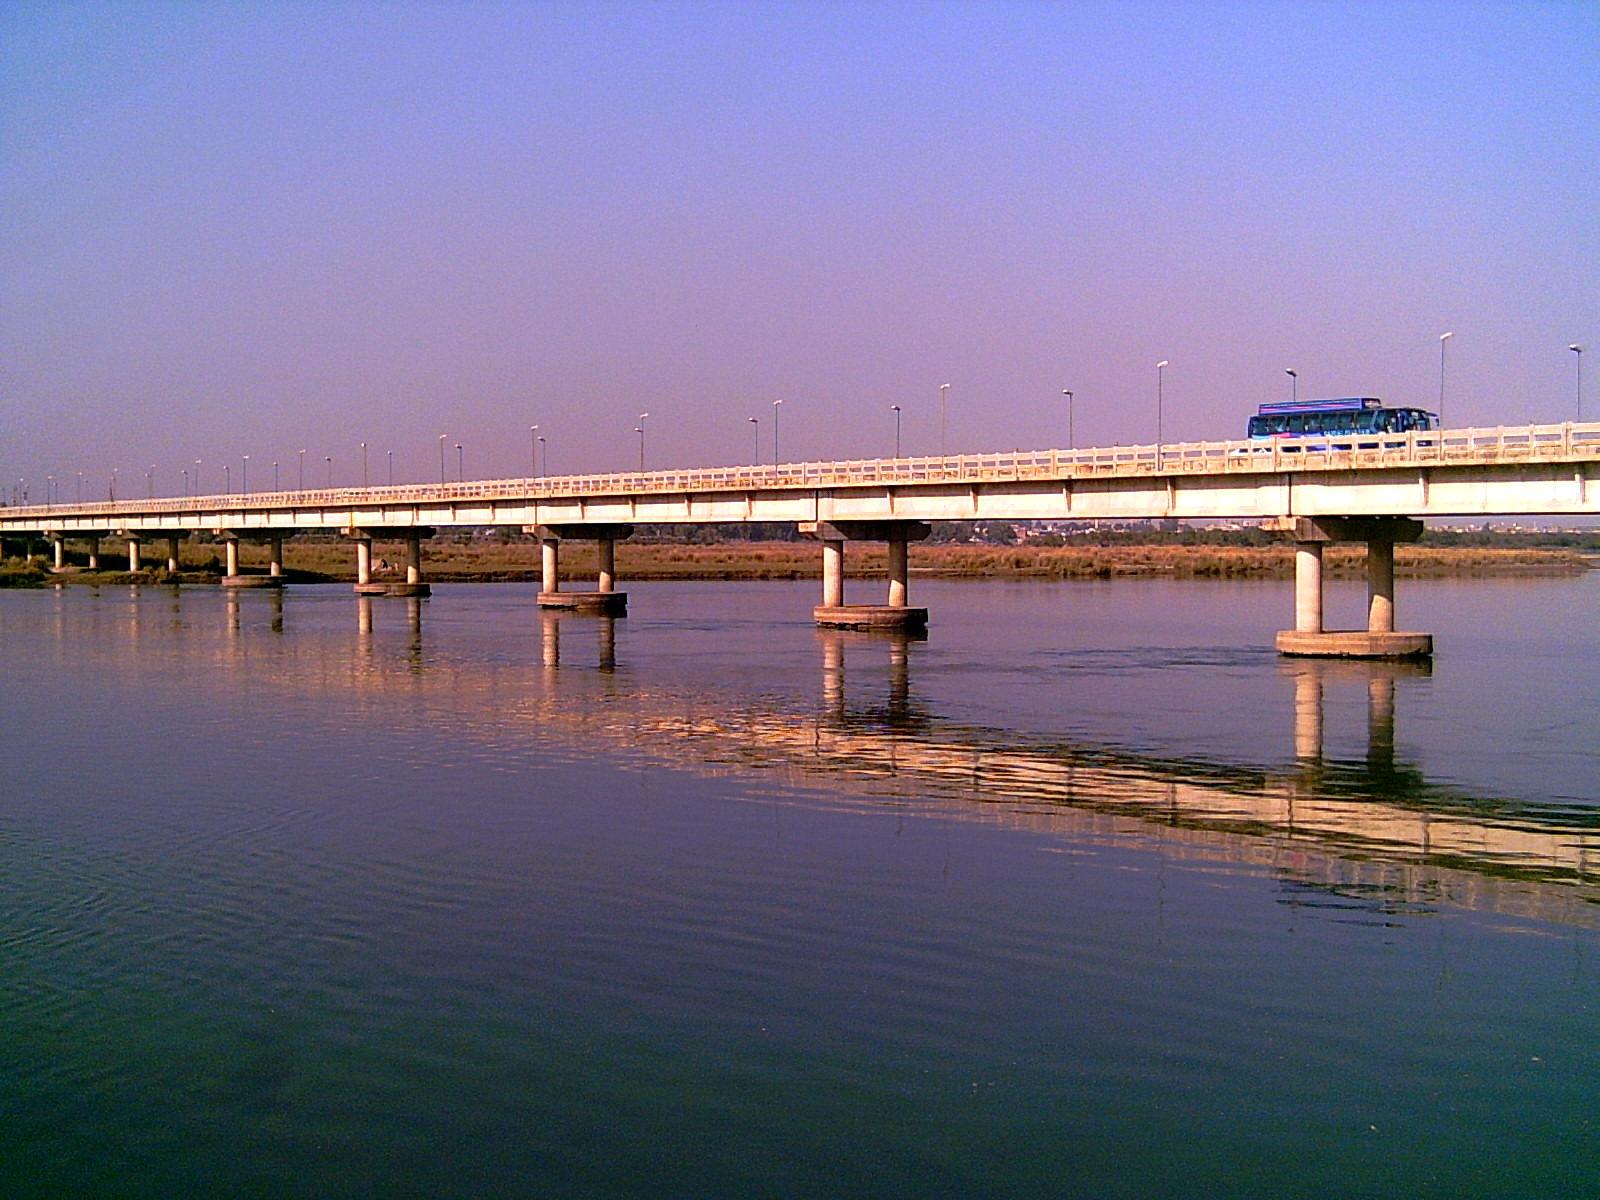 bridge on the river - photo #32